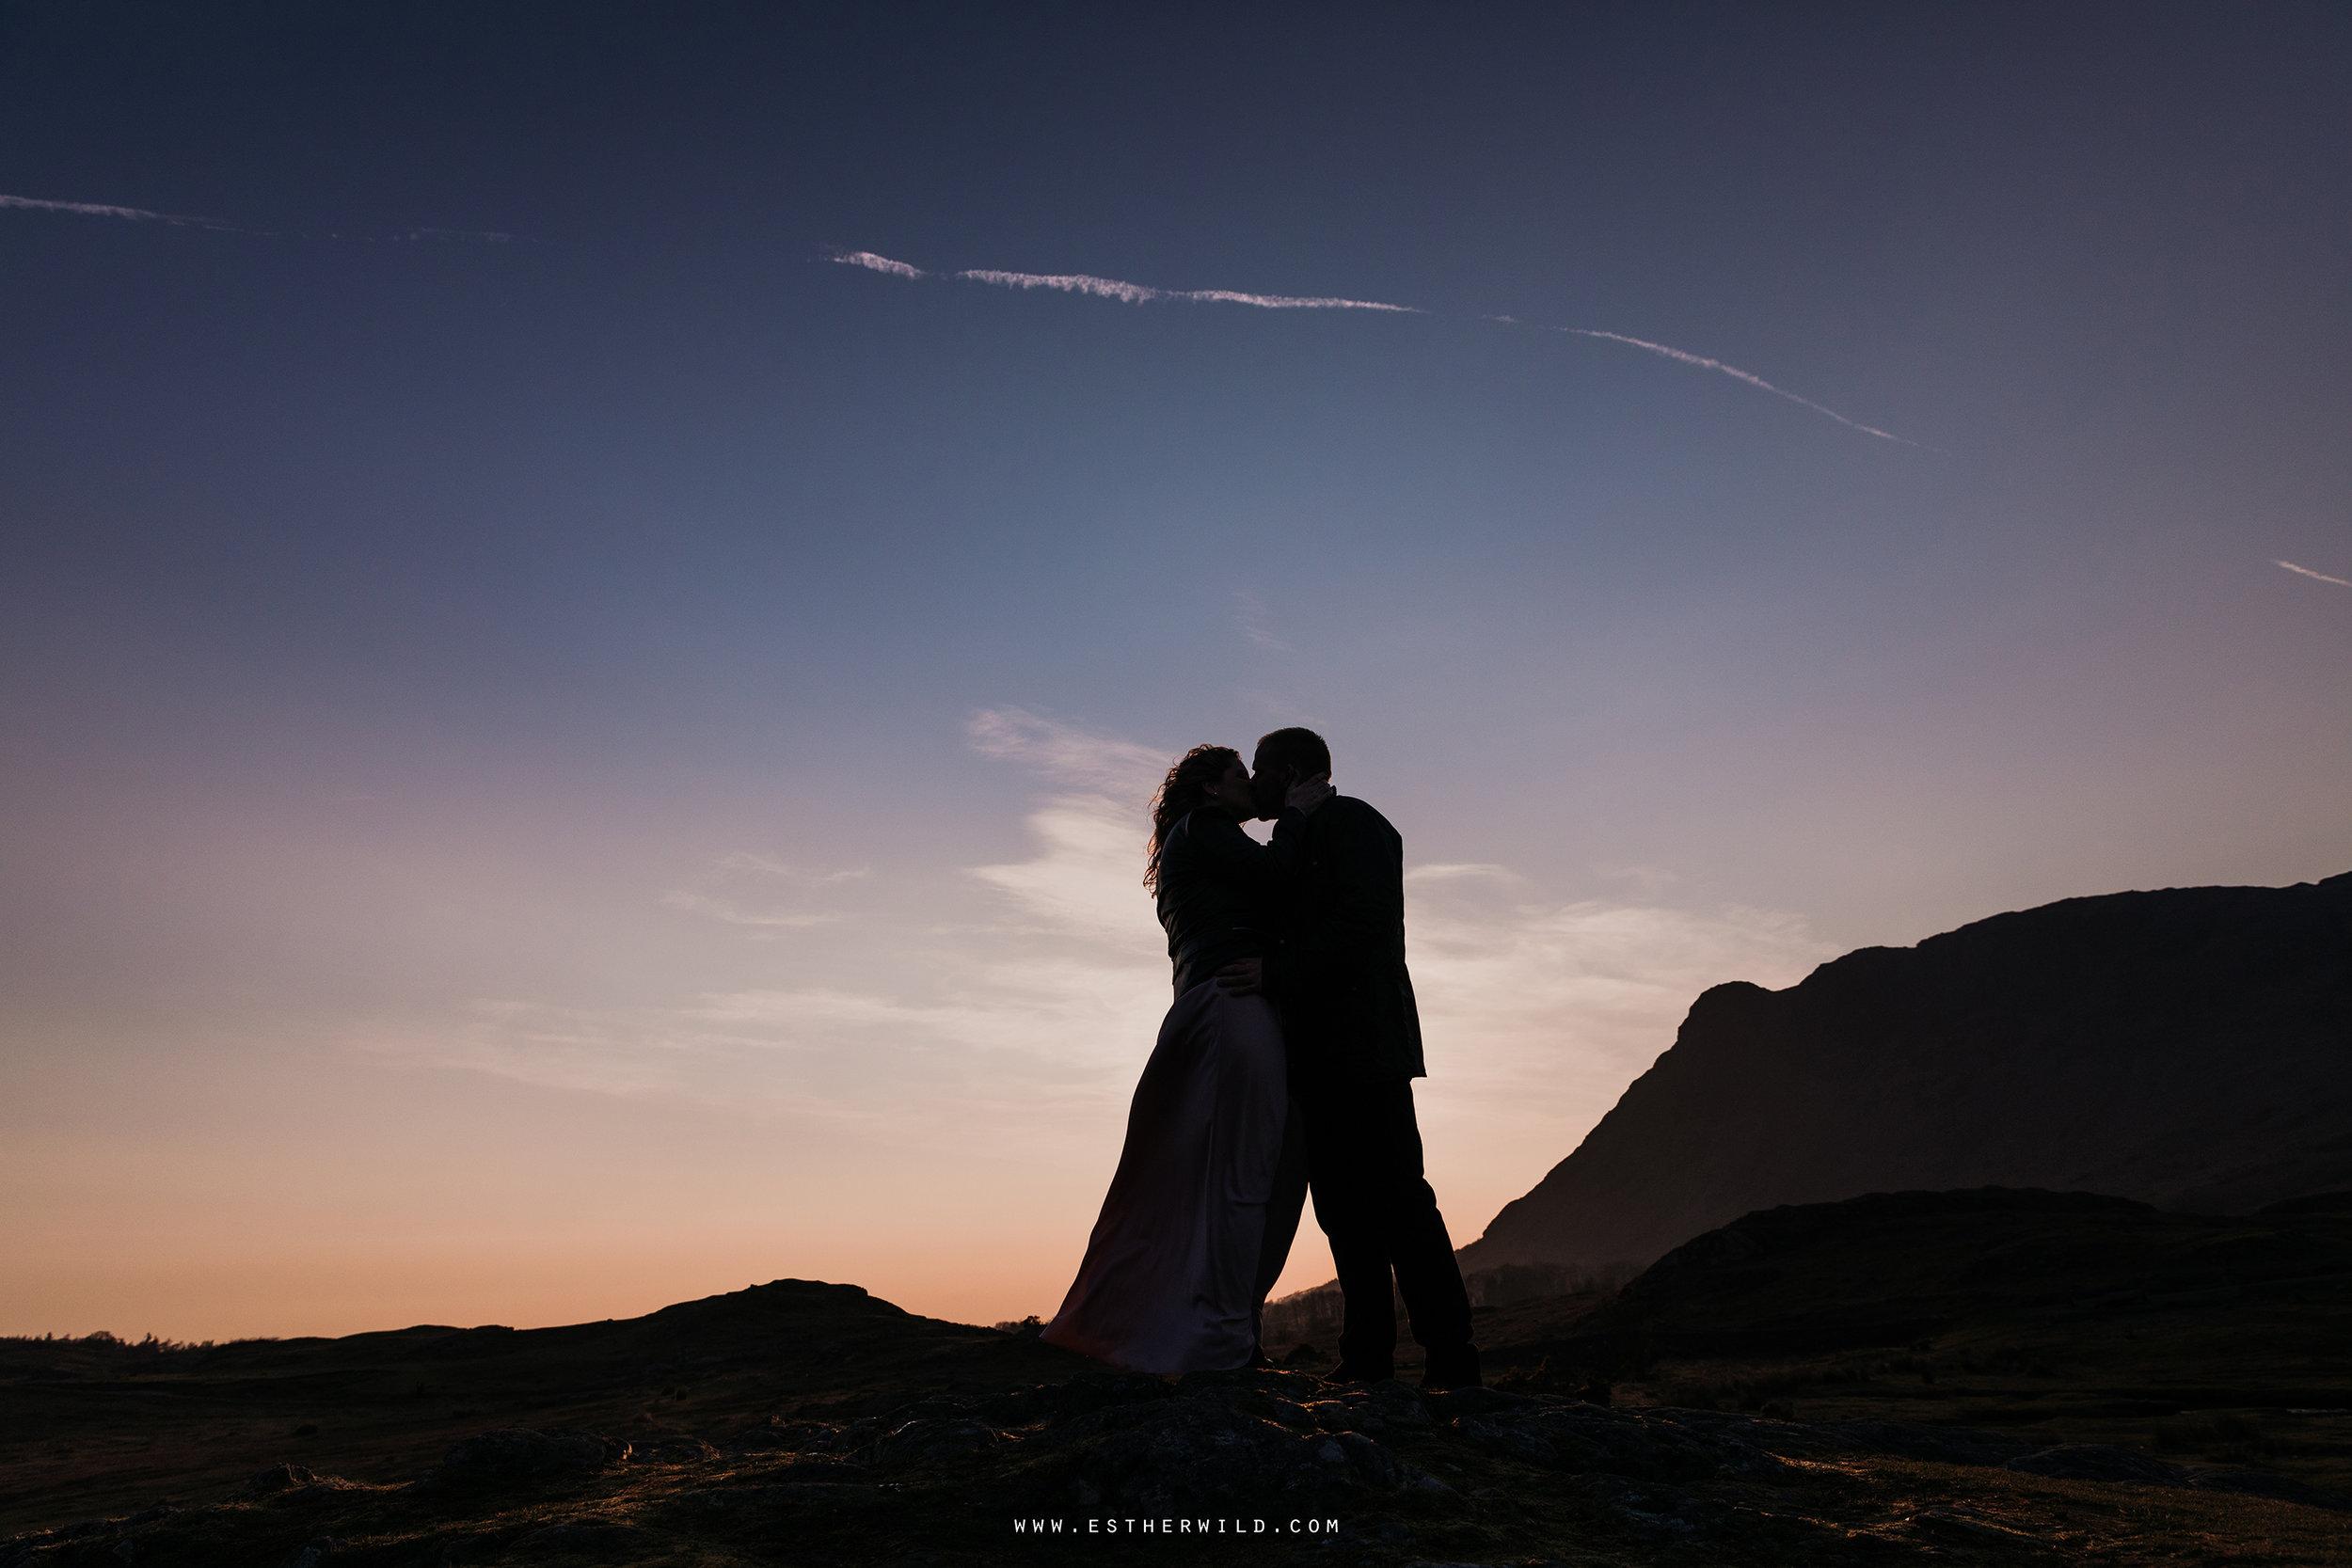 Cumbria_Lake_District_Wasdale_Wedding_Photographer_Destination_Engagement_Anniversary_Esther_Wild_IMG_4696.jpg